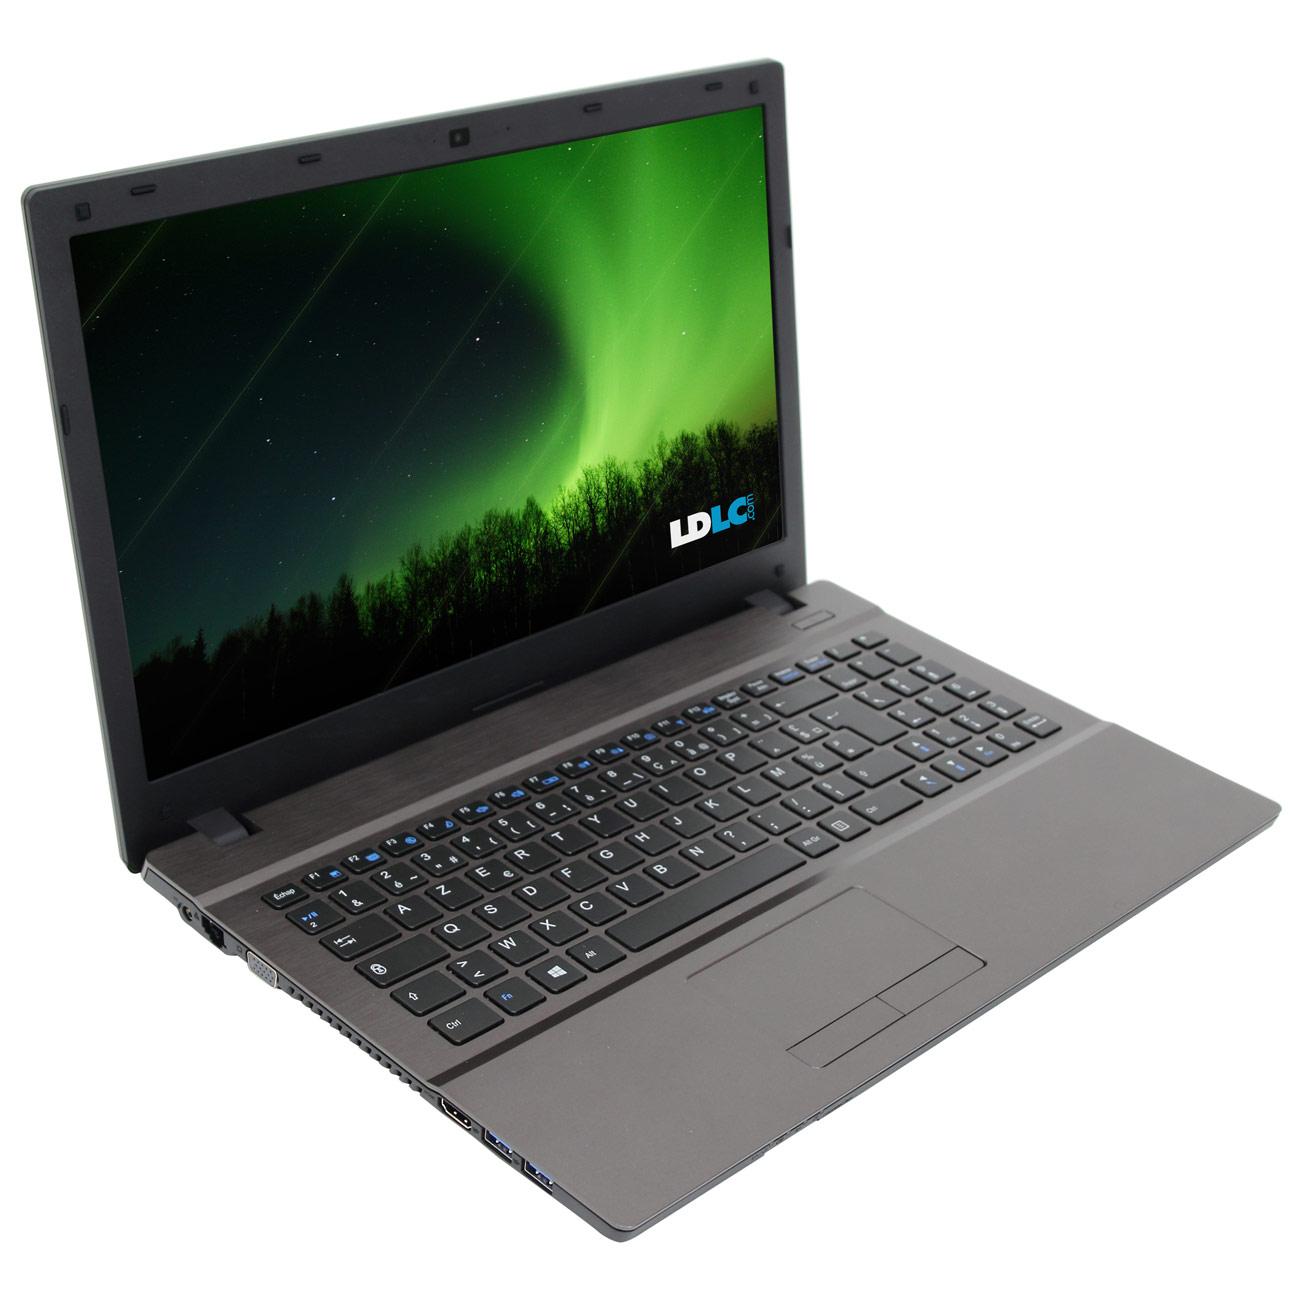 "PC portable LDLC Aurore BB5-I5-8-S2 Slim Intel Core i5-2410M 8 Go SSD 240 Go 15.6"" LED Graveur DVD Wi-Fi N/Bluetooth Webcam (sans OS)"